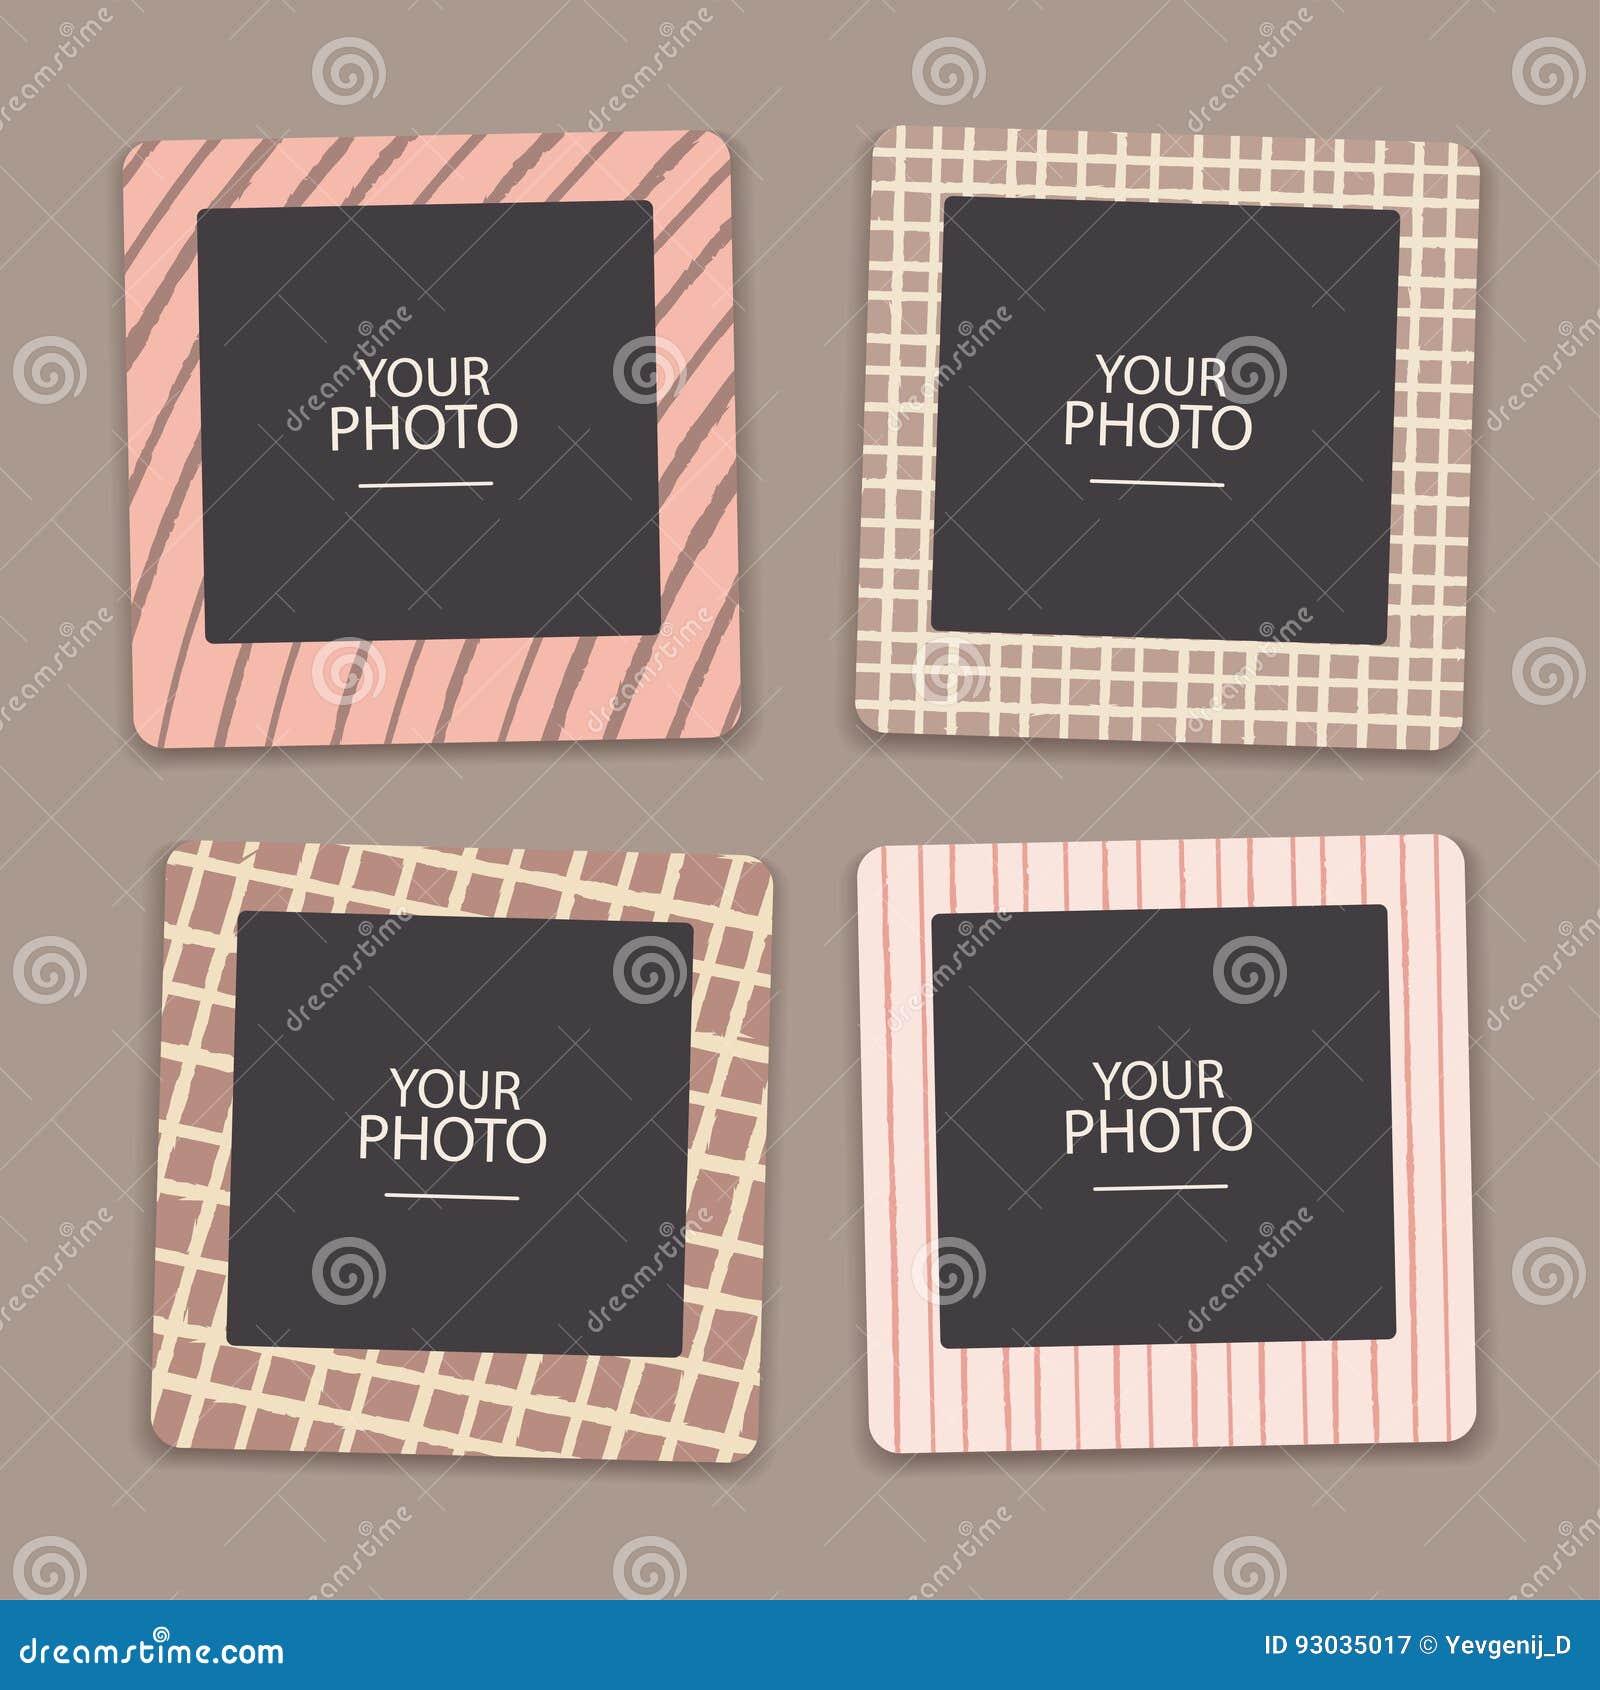 Vintage Photo Frames Collage Scrapbook Retro Design Concept Album